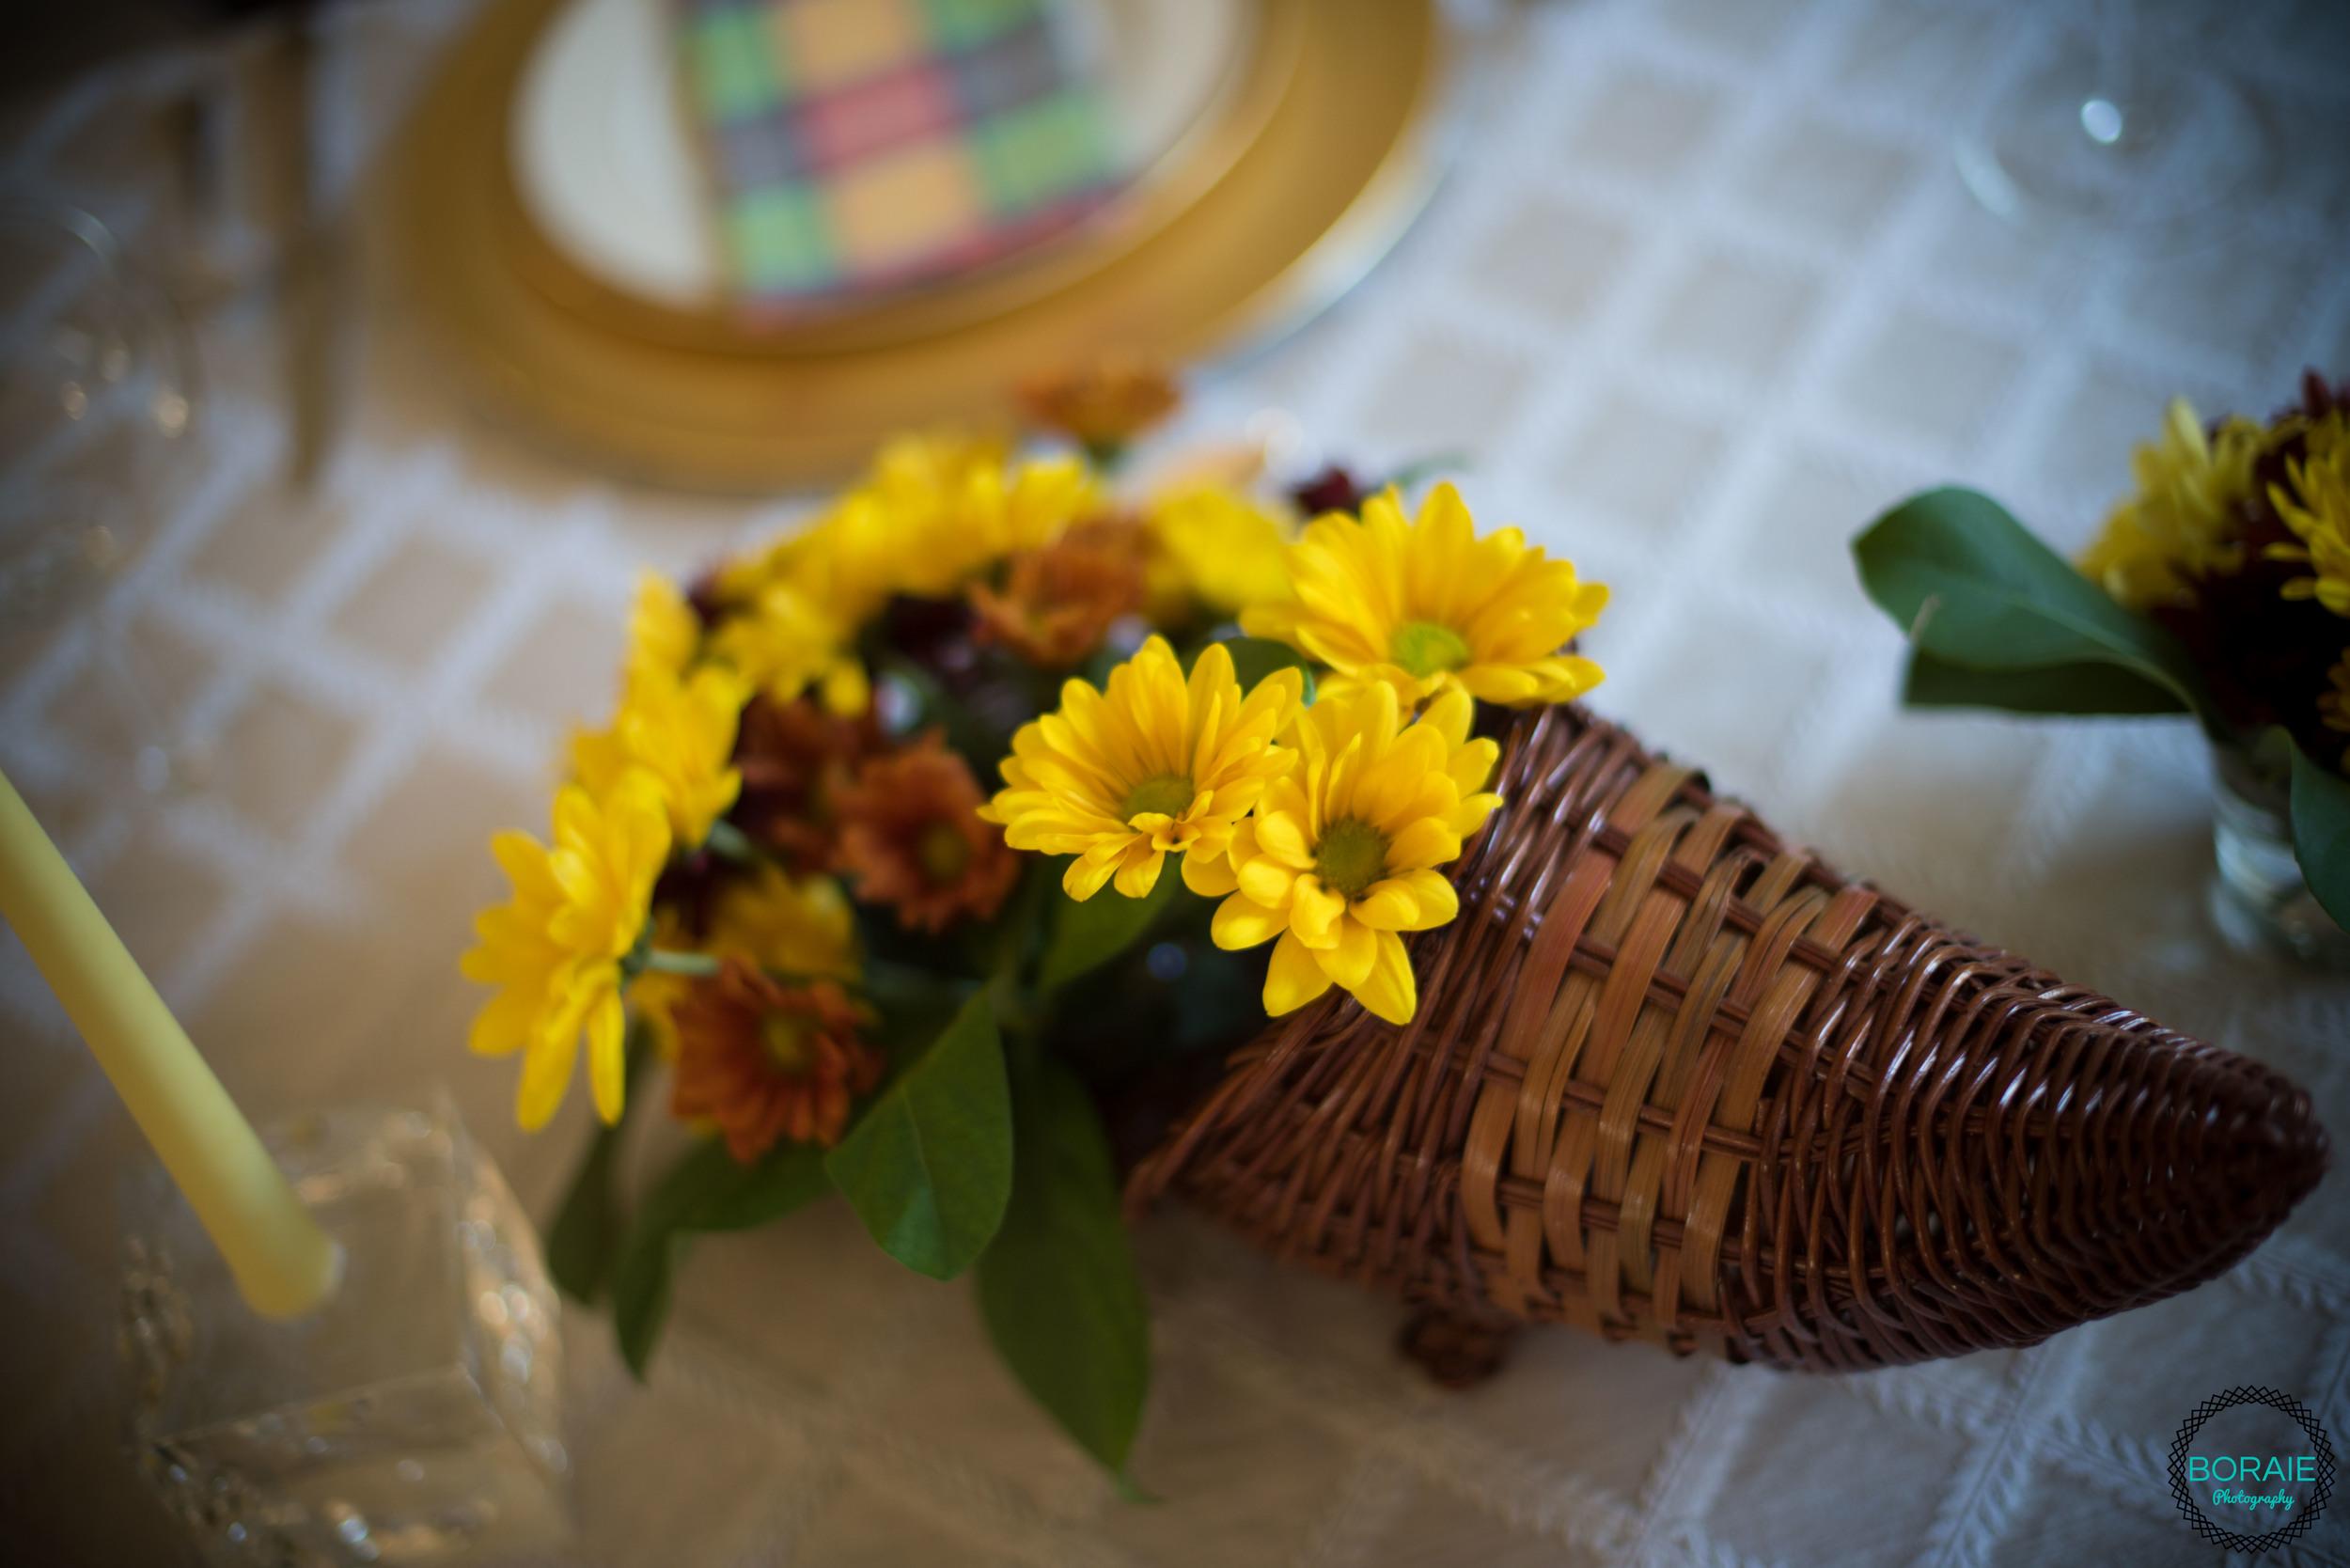 Thanksgiving - (www.boraiephotography.com) -8.JPG